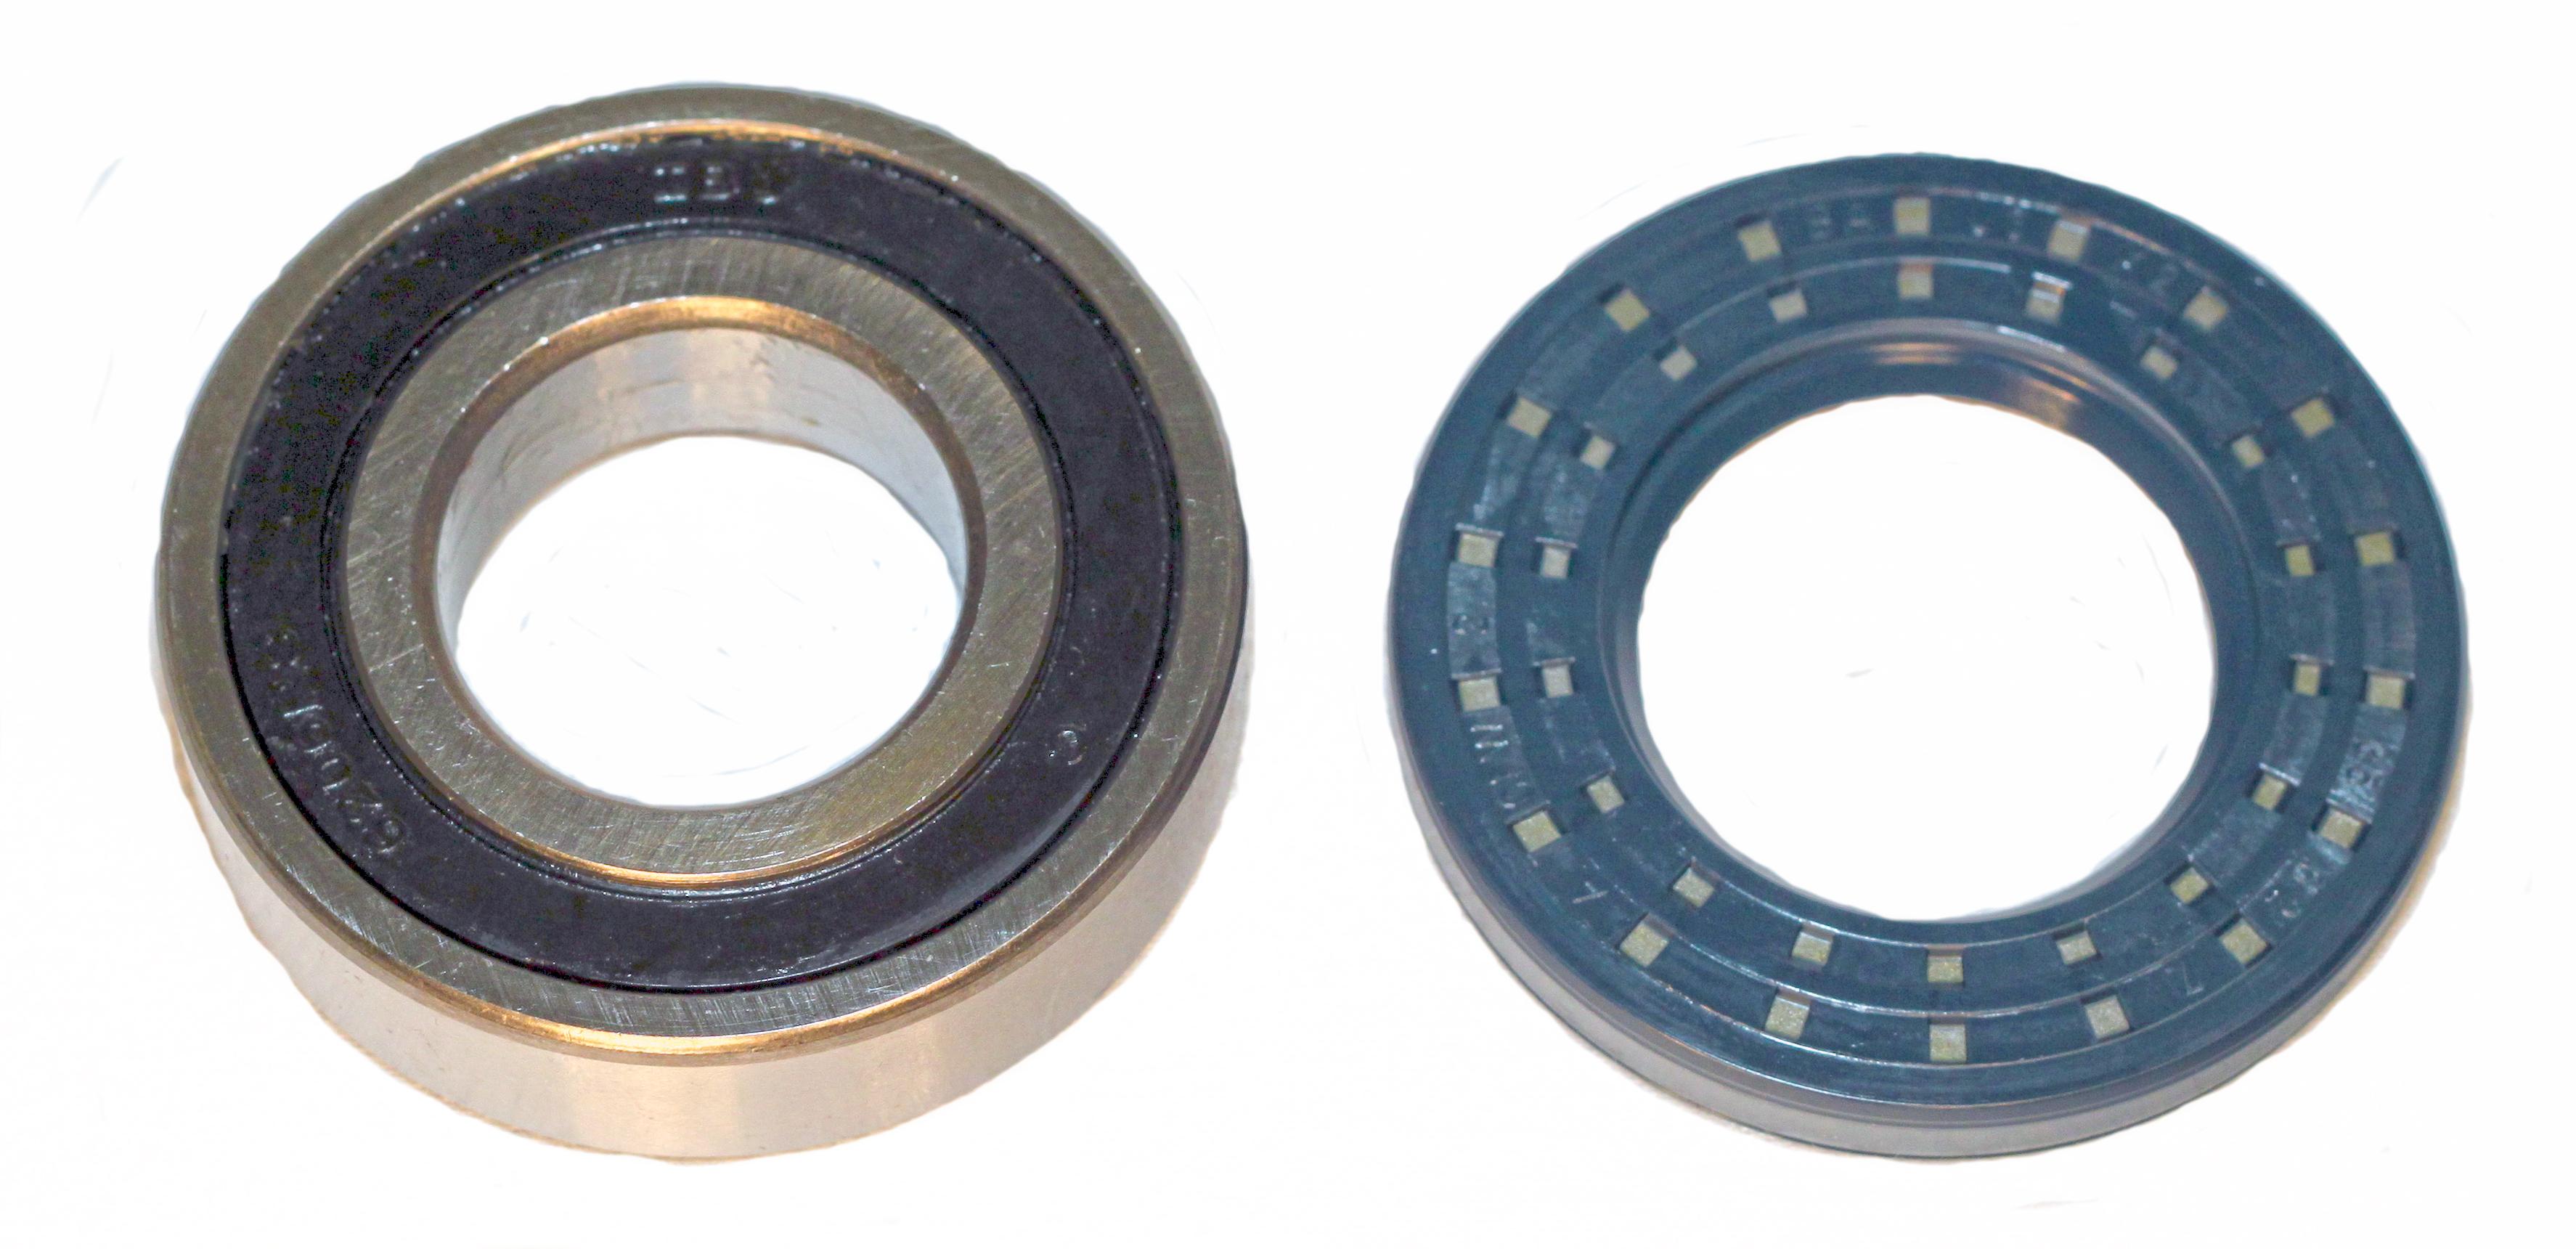 Rep.sats svänghjulskåpa 31-, 32-, 41-, 42-, 43-, 44-, 300-motorer m. DP-E, DP-D, DPG drev